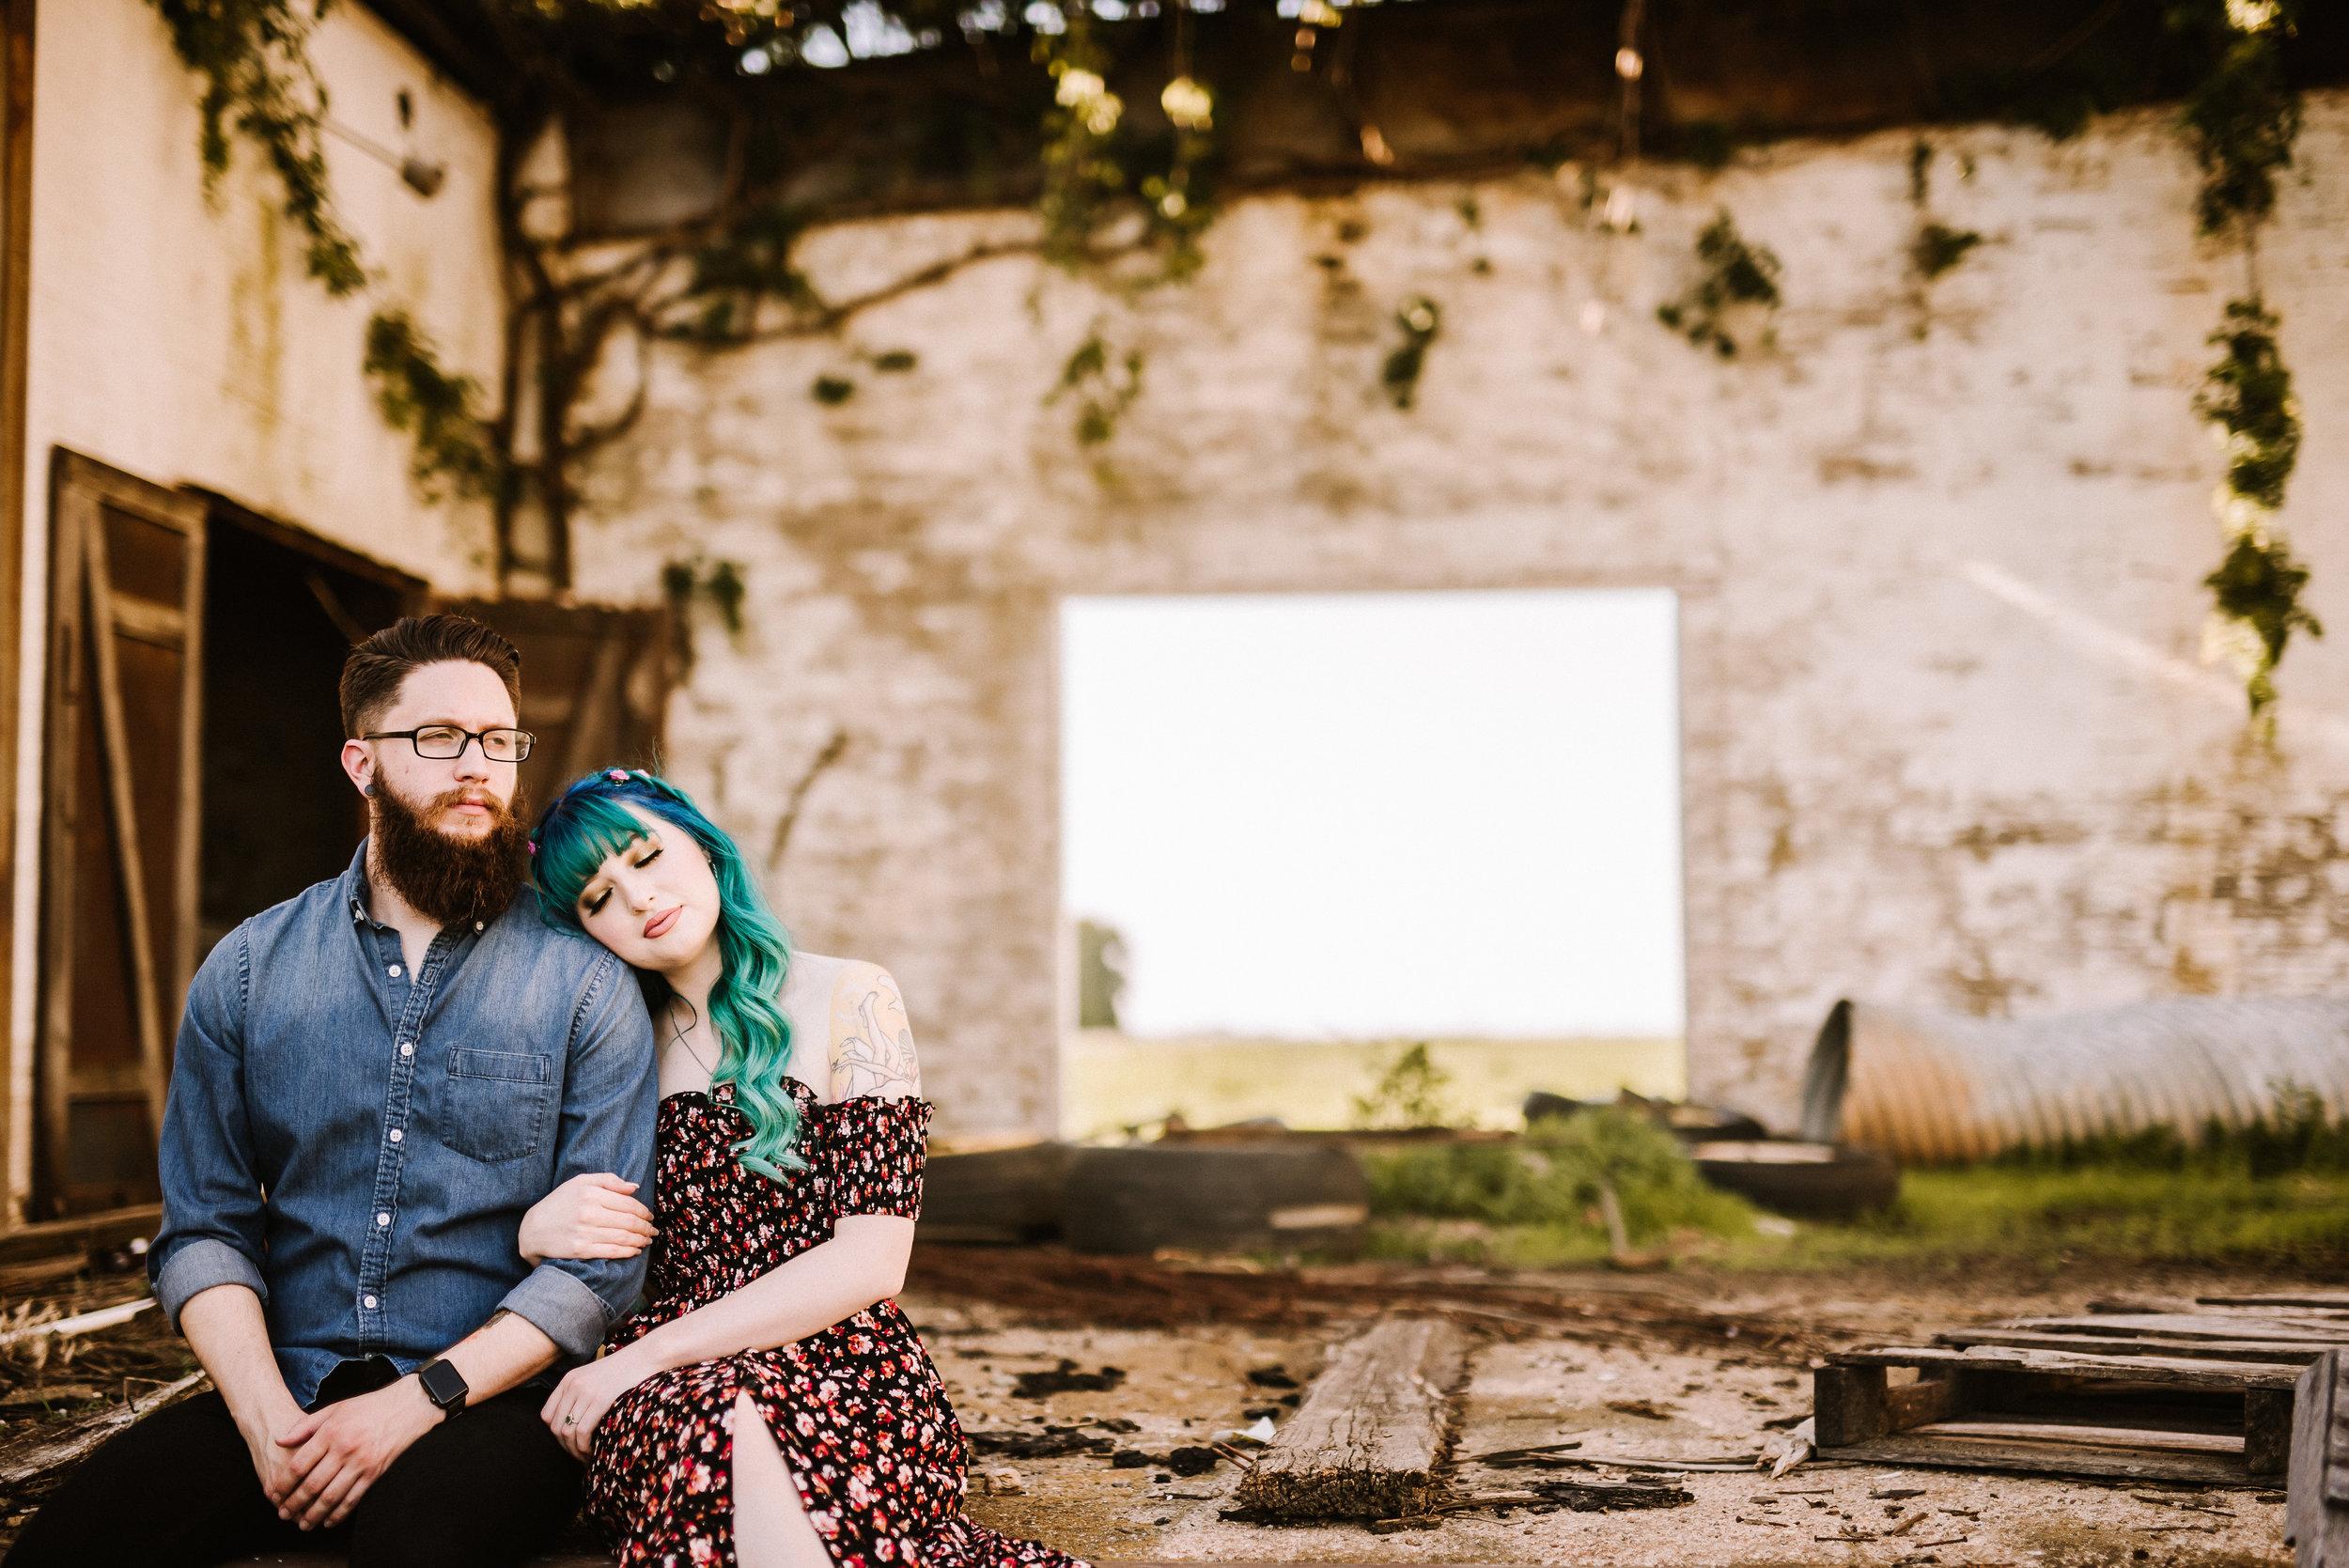 Kelly & Matt_Engagement Session_Wilson Arkansas_Ashley Benham Photography-99.jpg